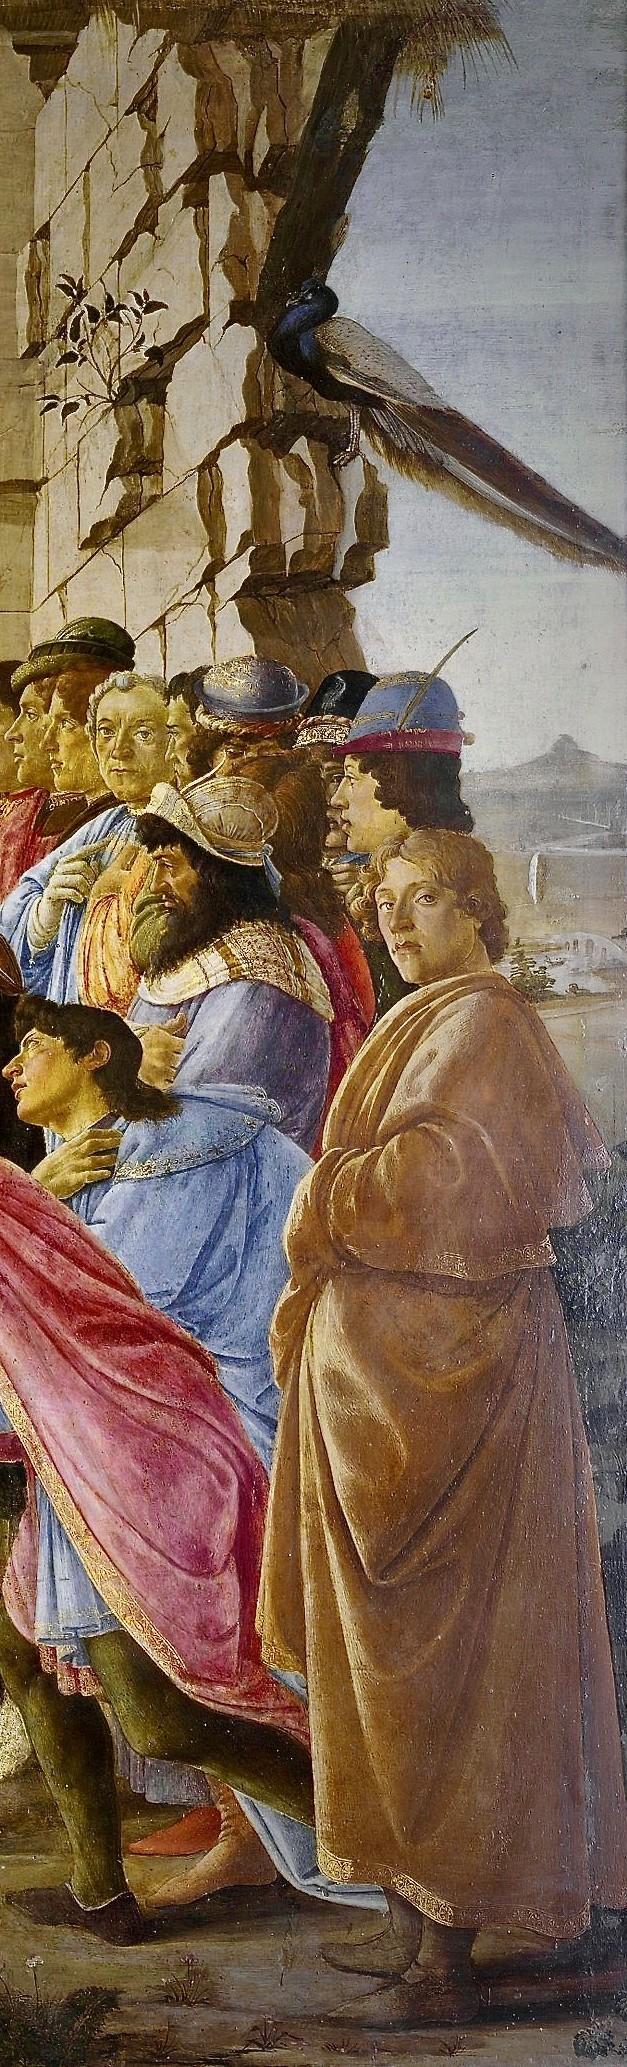 botticelli_-_adoration_of_the_magi_zanobi_altar_-_uffizi